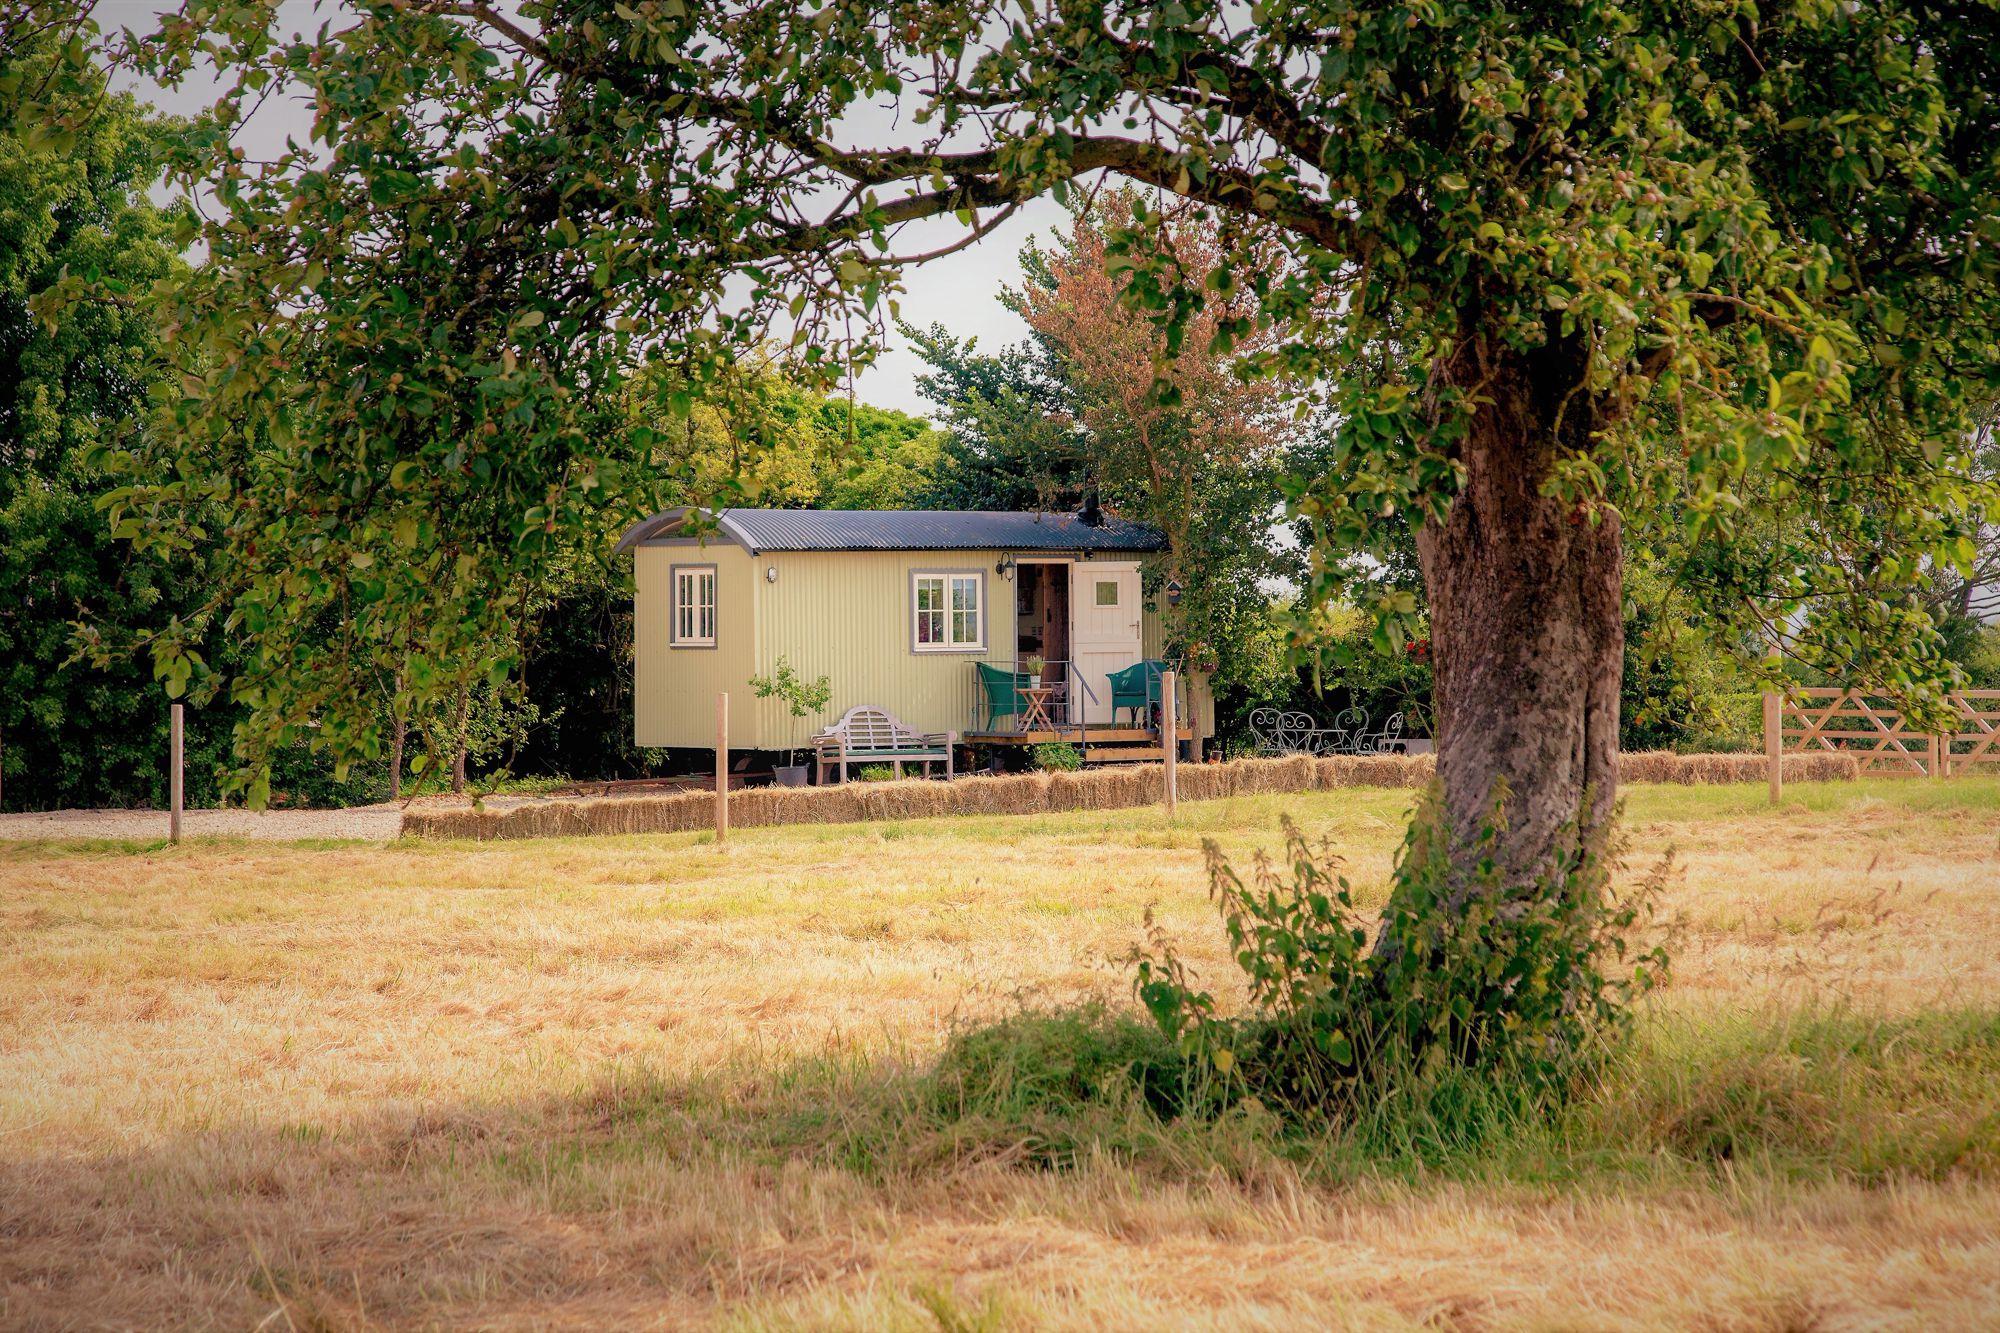 Shepherd's Huts – The Best Shepherd's Hut Glamping Sites